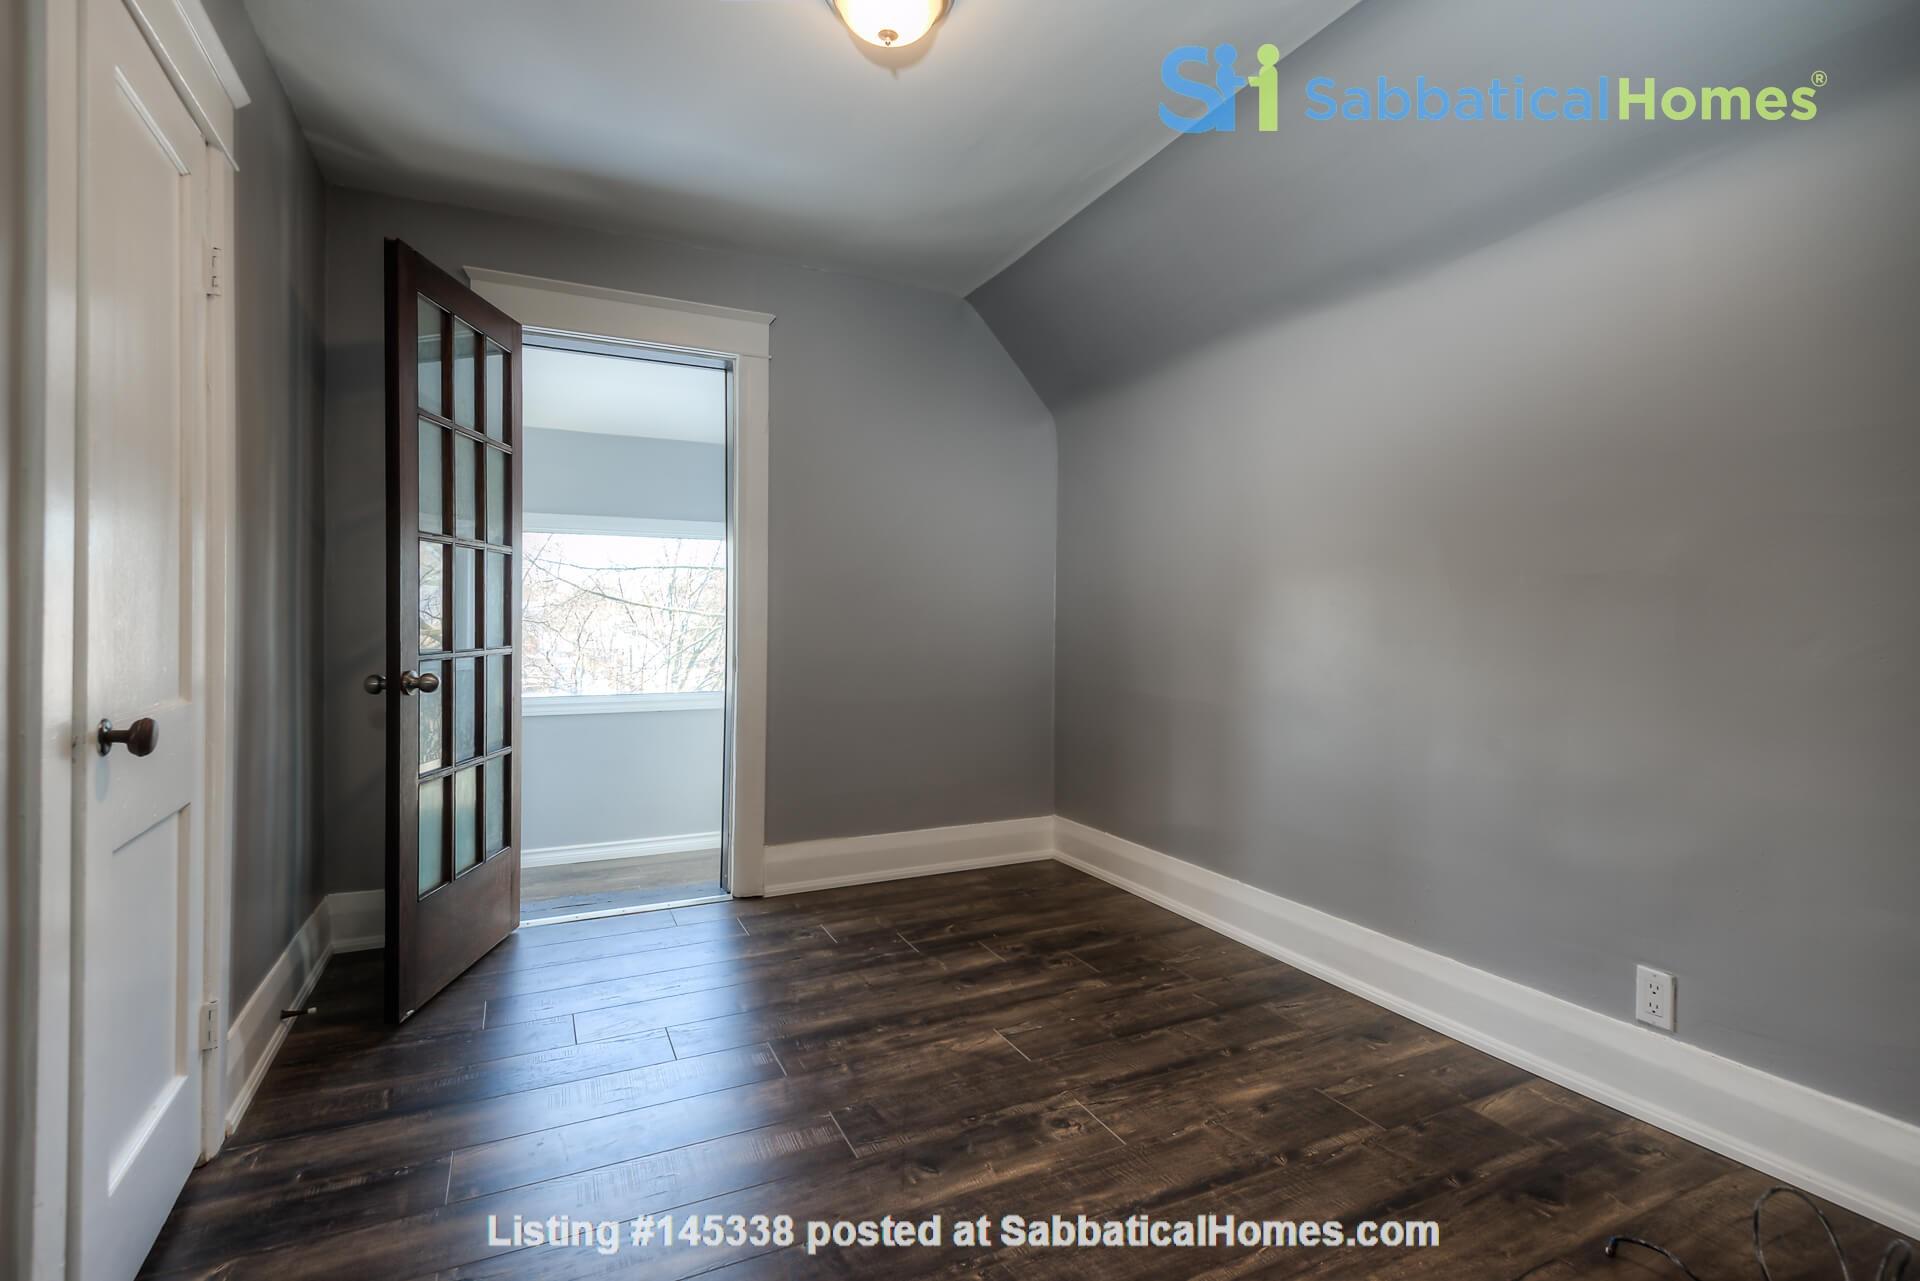 3 bdrm home (unfurnished) - downtown Kitchener-Waterloo Home Rental in Kitchener, Ontario, Canada 7